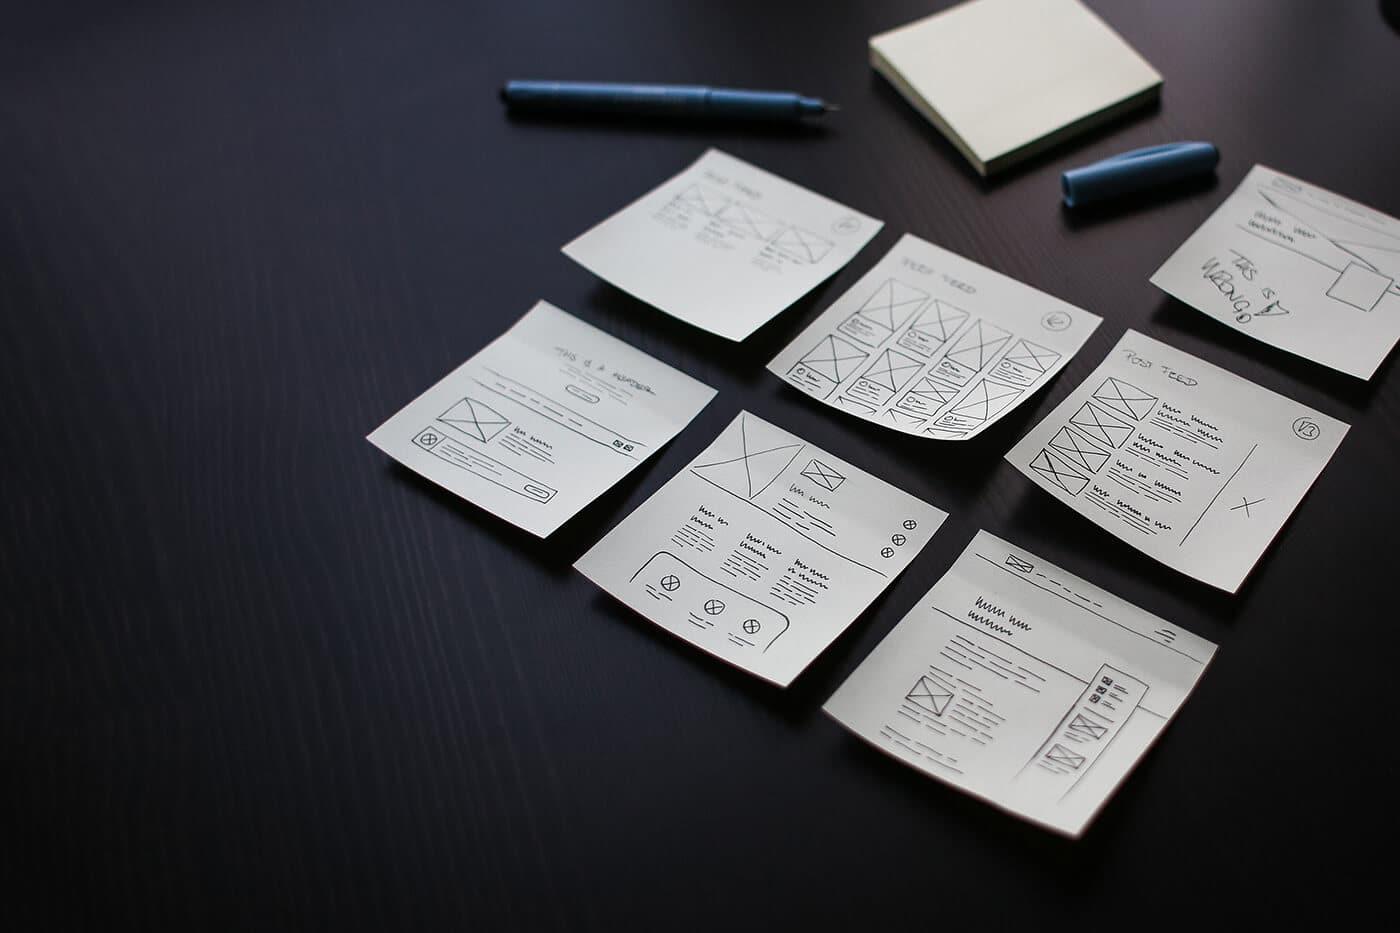 Thinking Notes 17